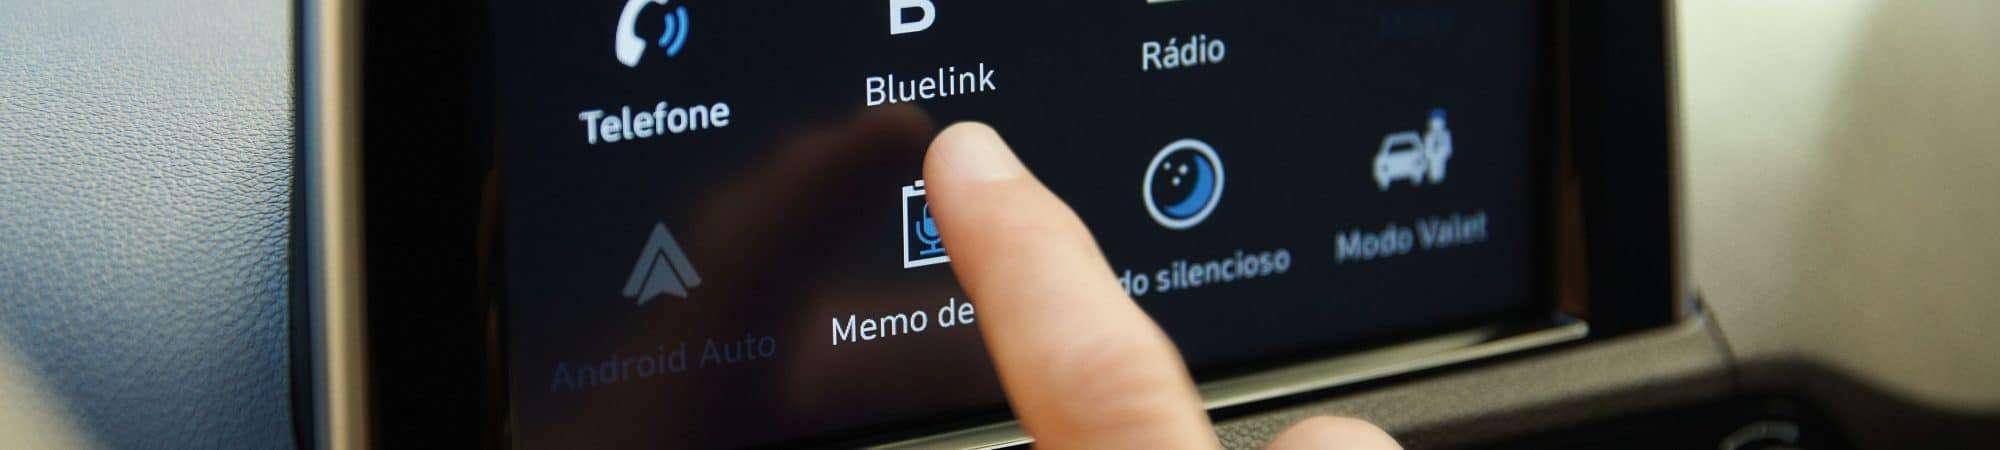 Hyundai_Bluelink_7-2000x450